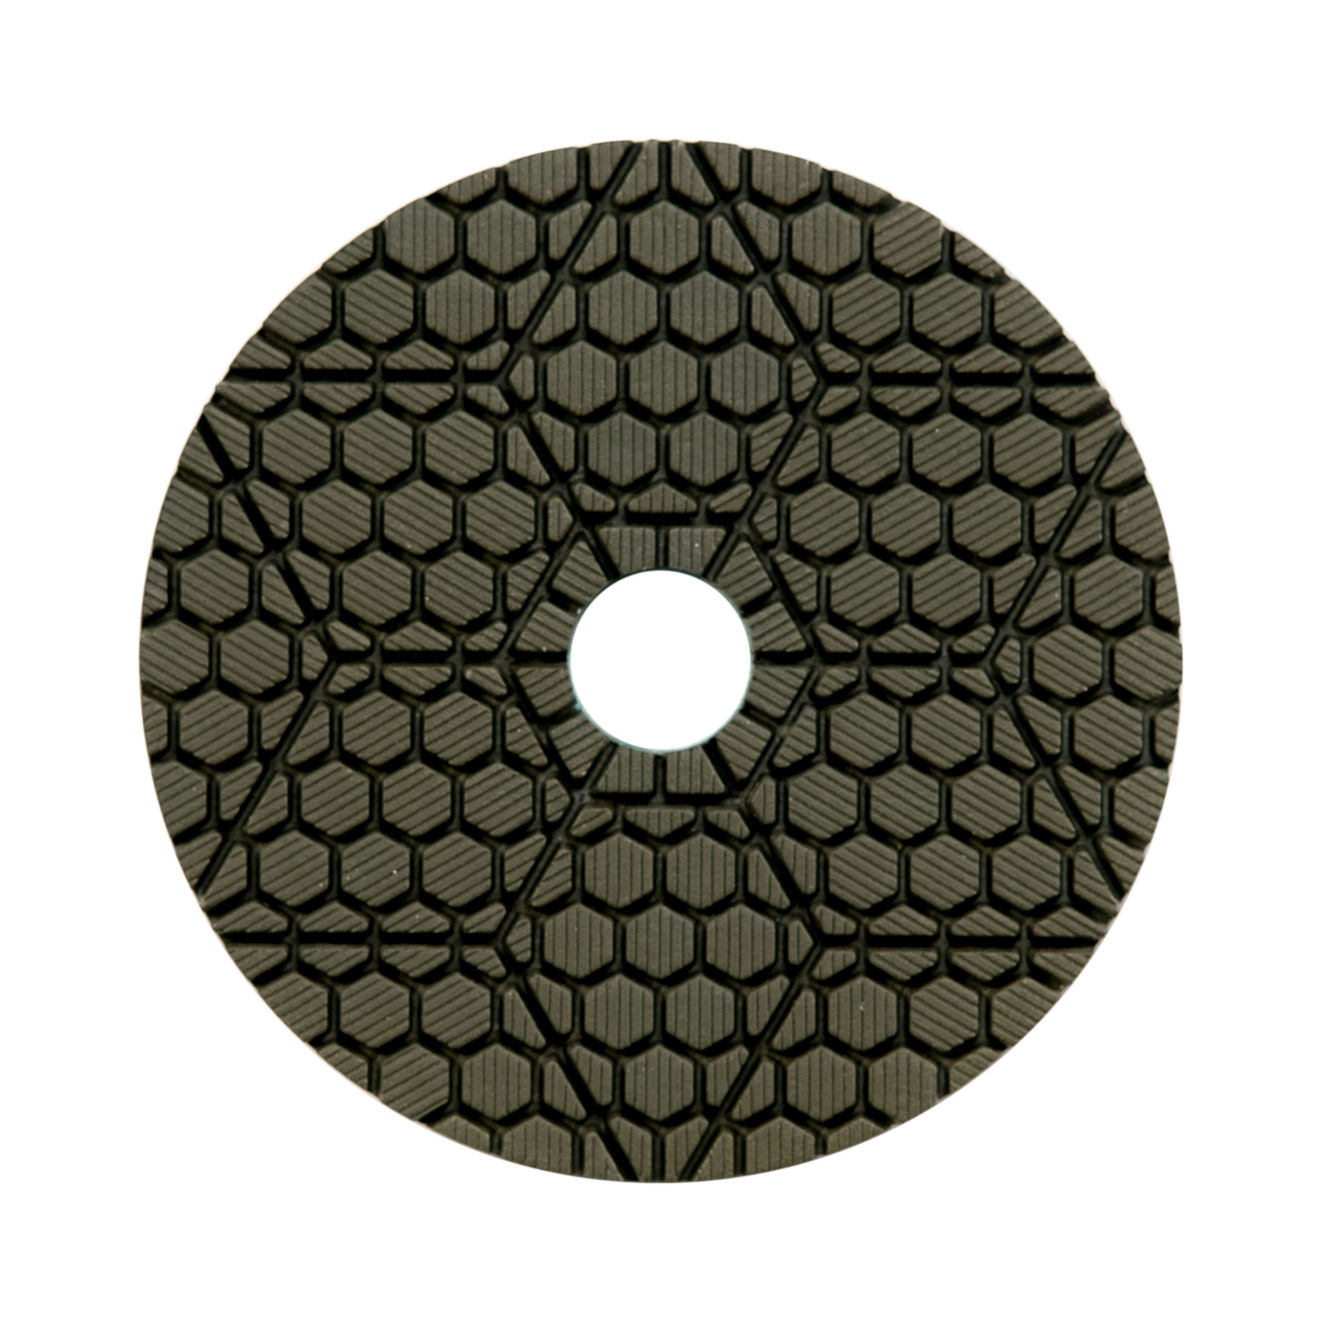 "ODYN Premium Wet Stone Polishing Pad 4"" x 5/8"" - 1500 Grit"